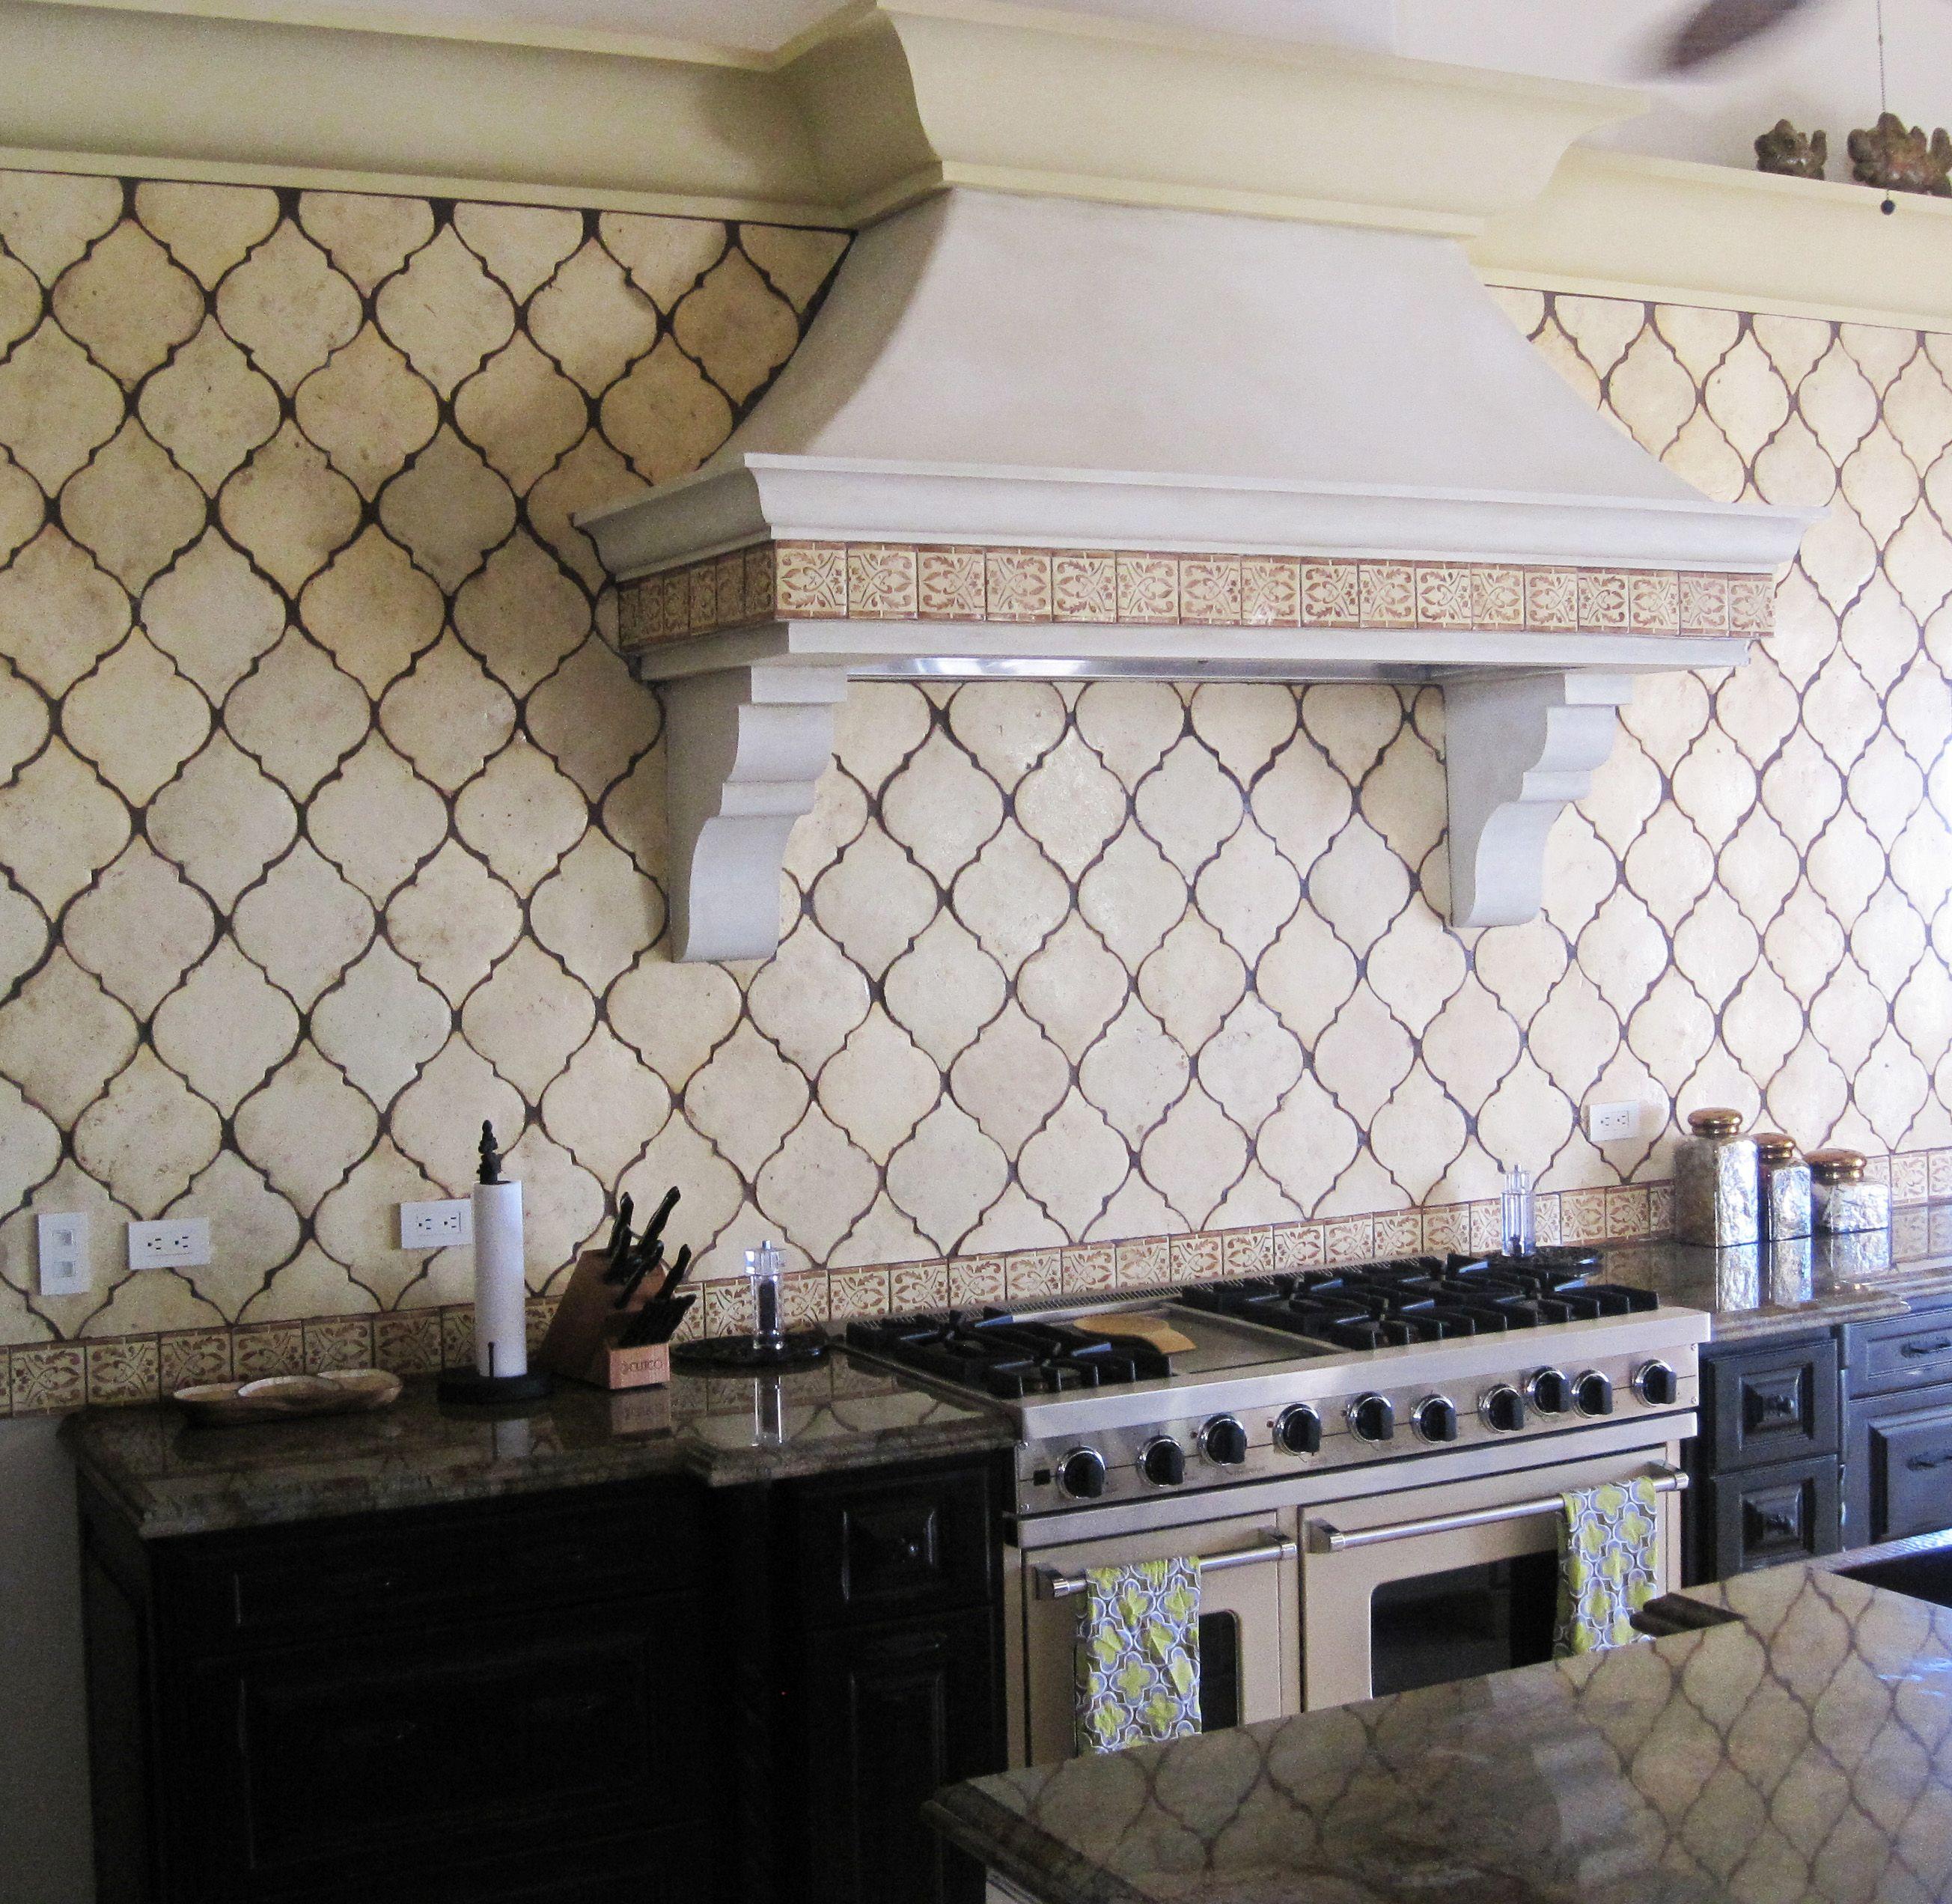 Old Kitchen Tile: Arabesque Tile Backsplash, Border Tiles